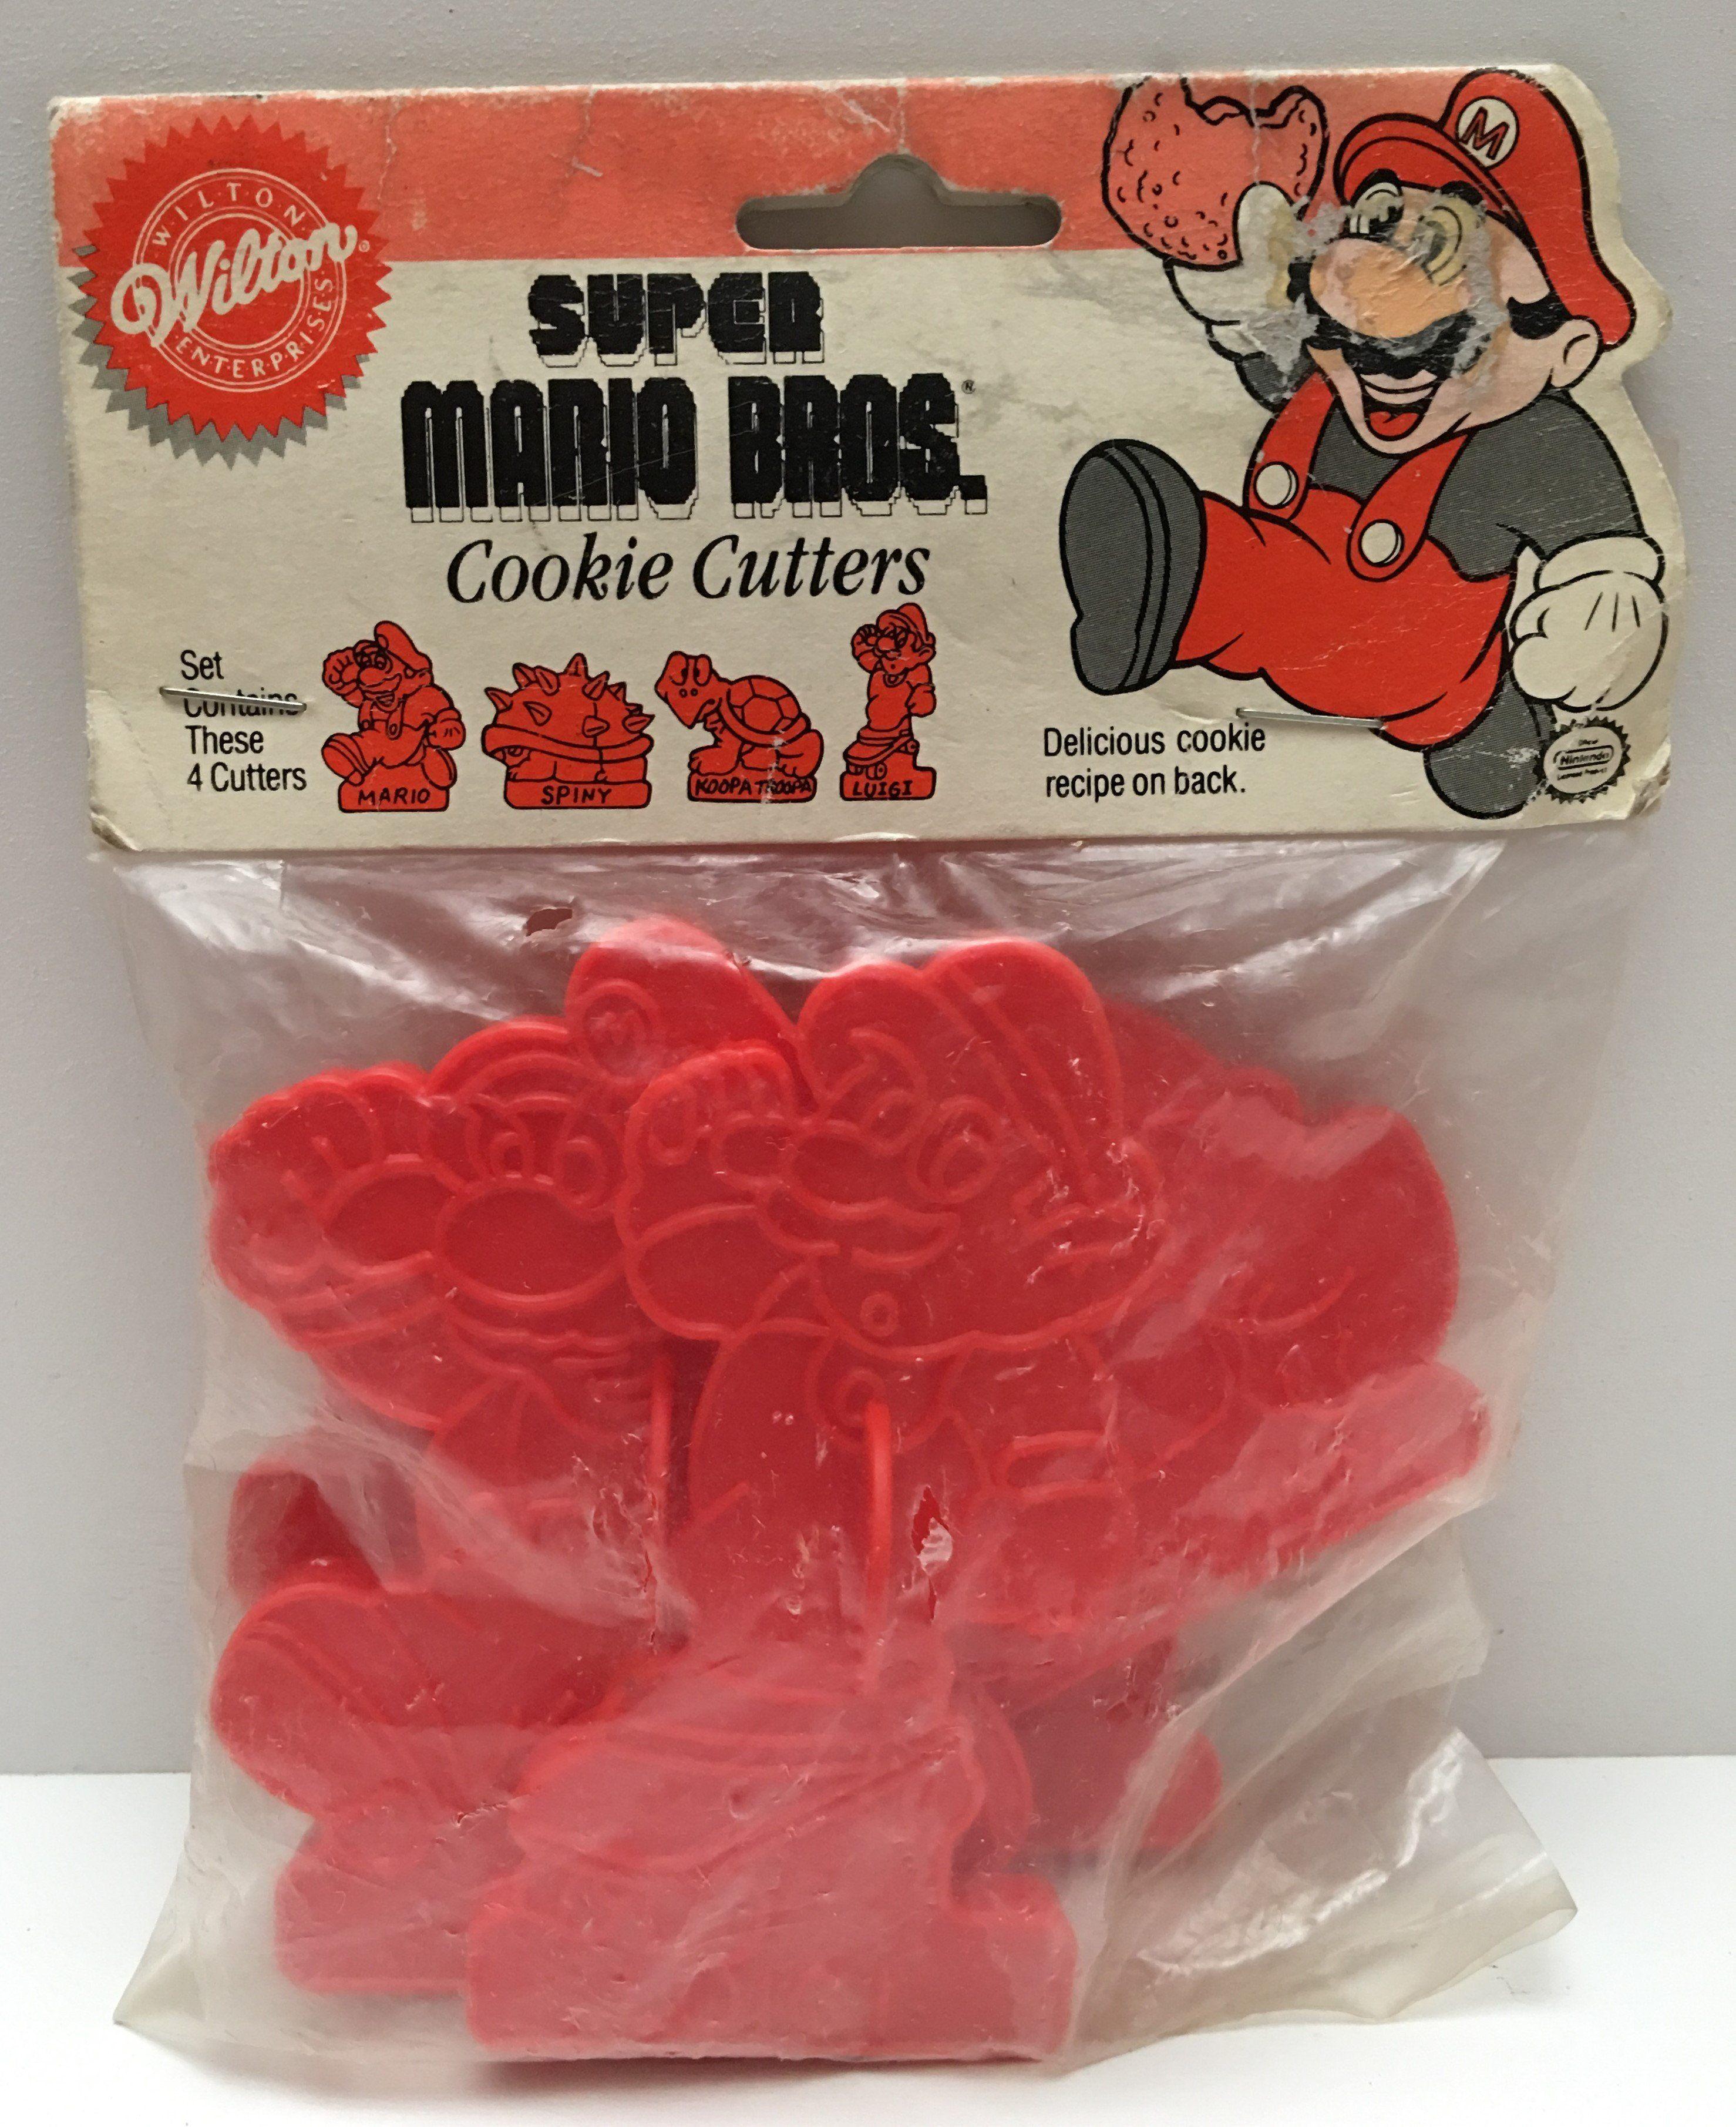 Video Game 266-A023 Cookie Cutter Set